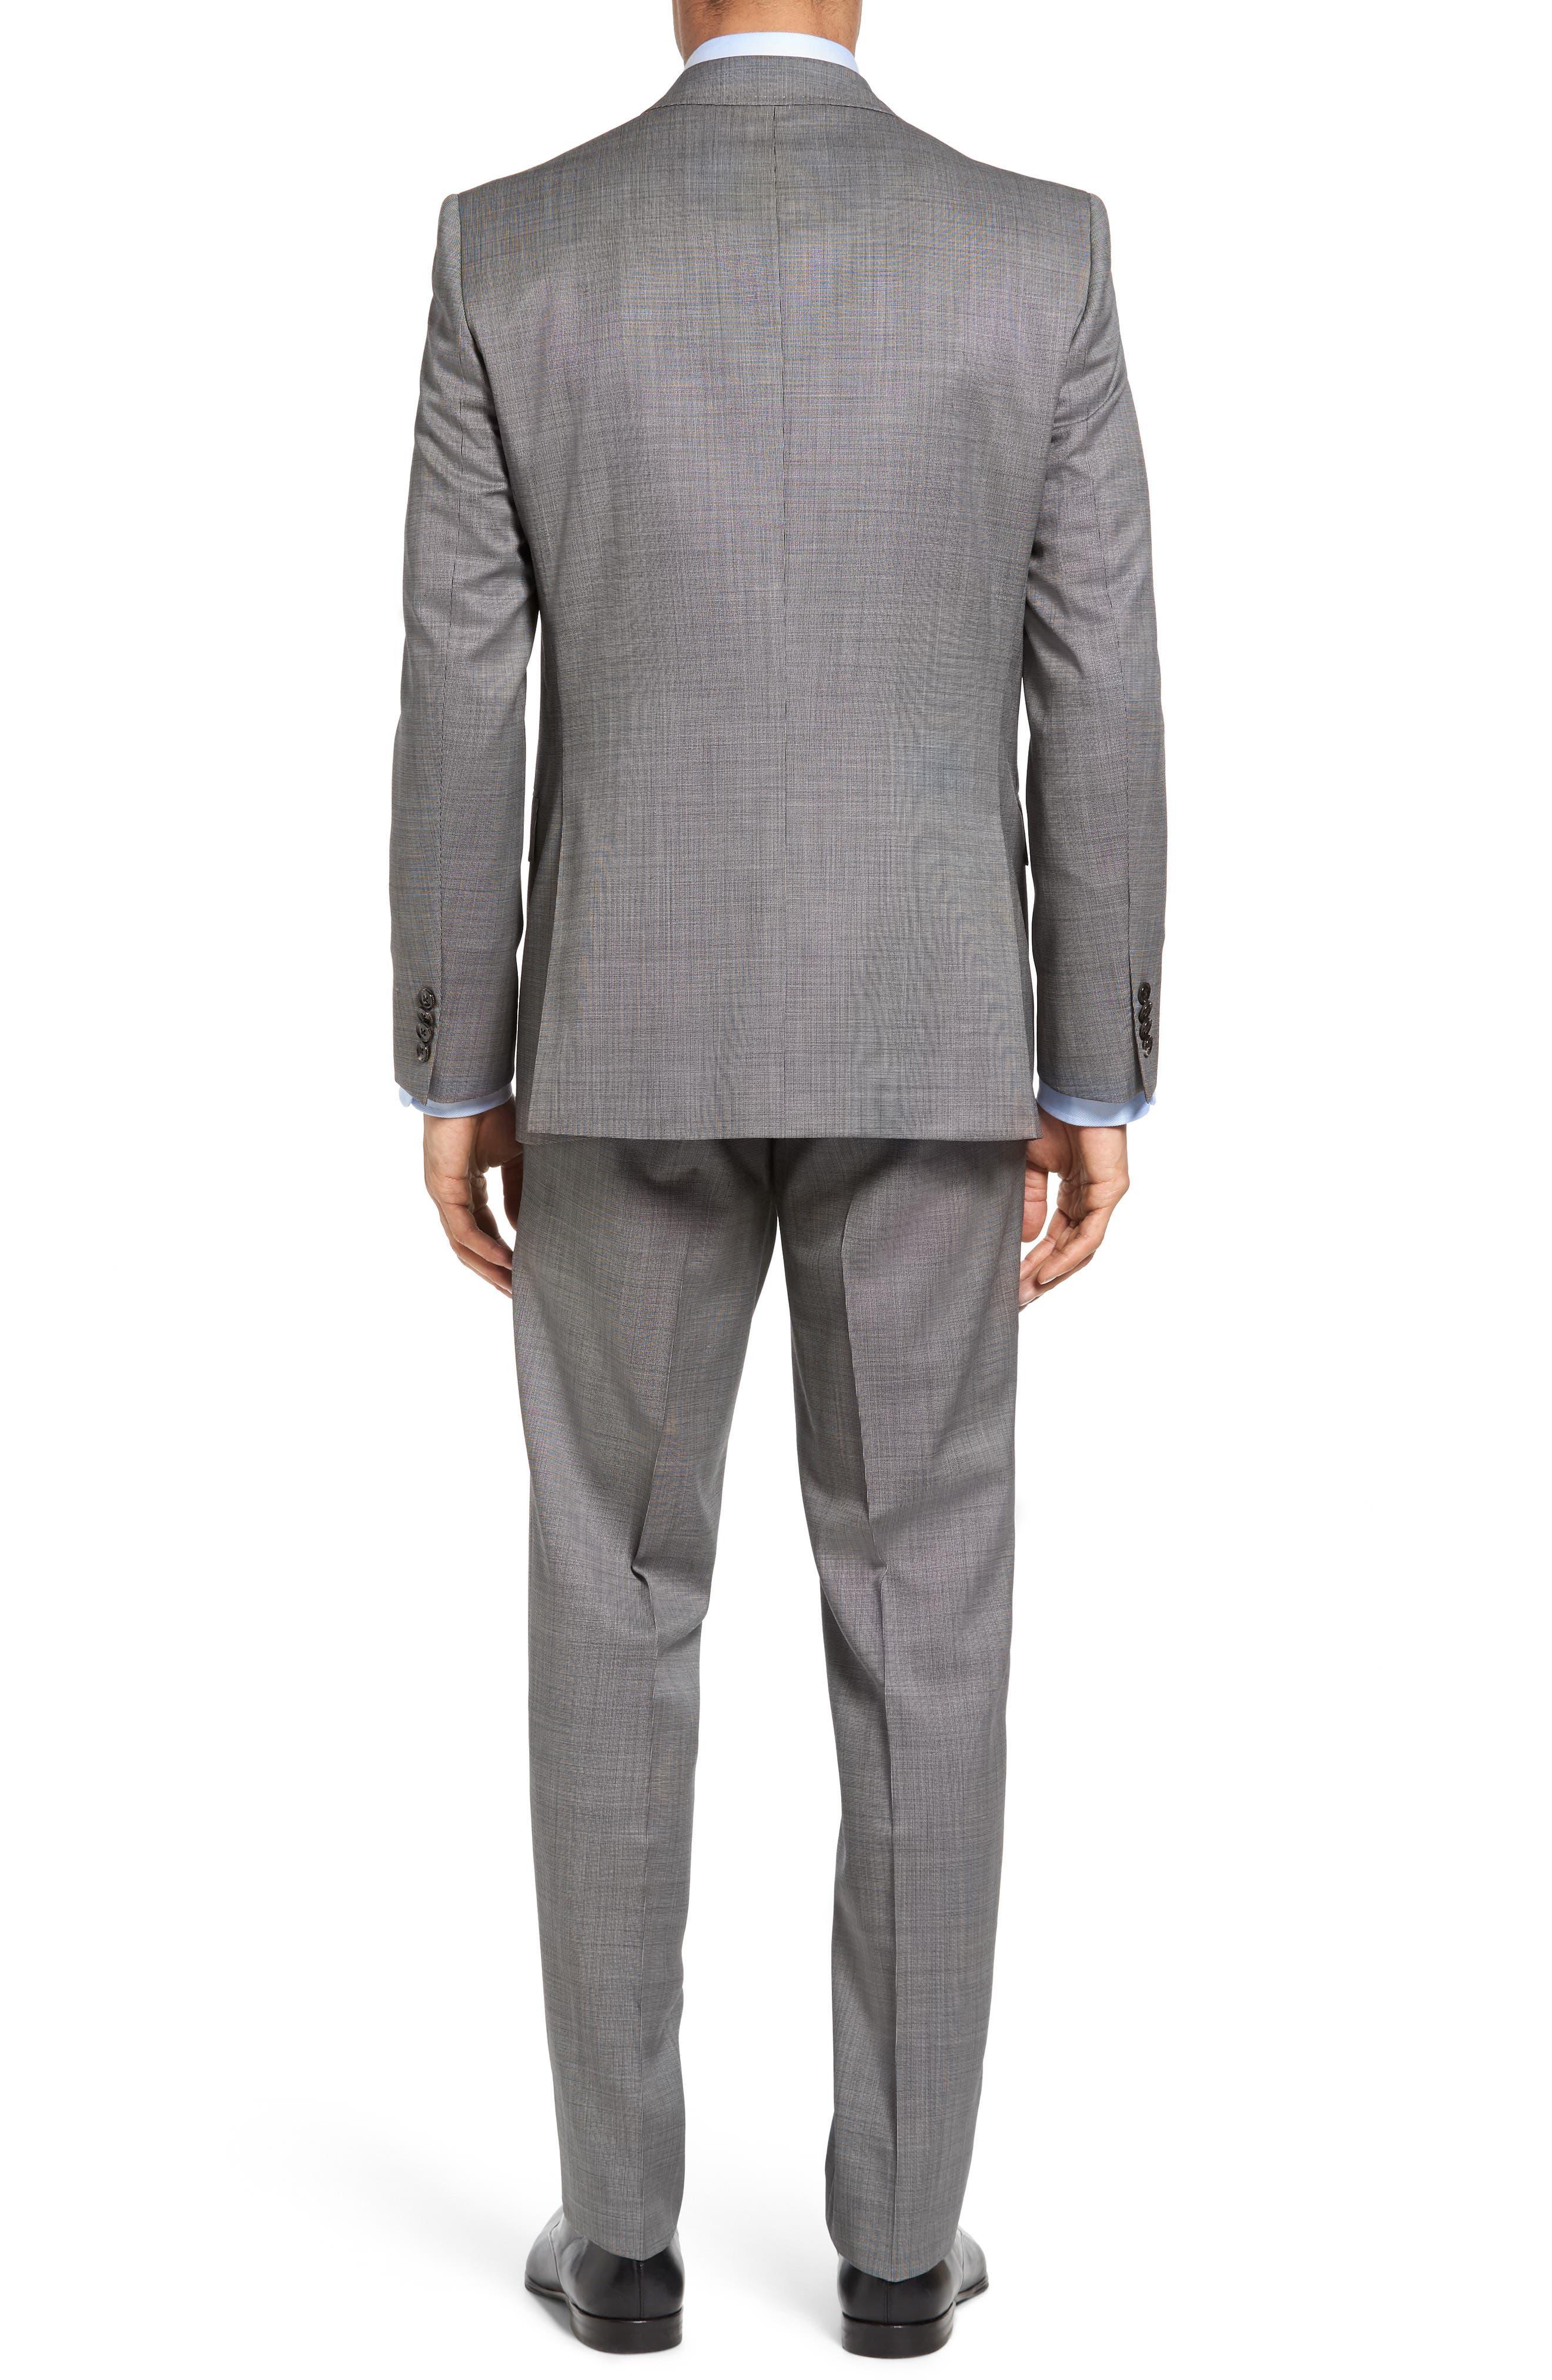 Jay Trim Fit Solid Wool Suit,                             Alternate thumbnail 3, color,                             LIGHT GREY